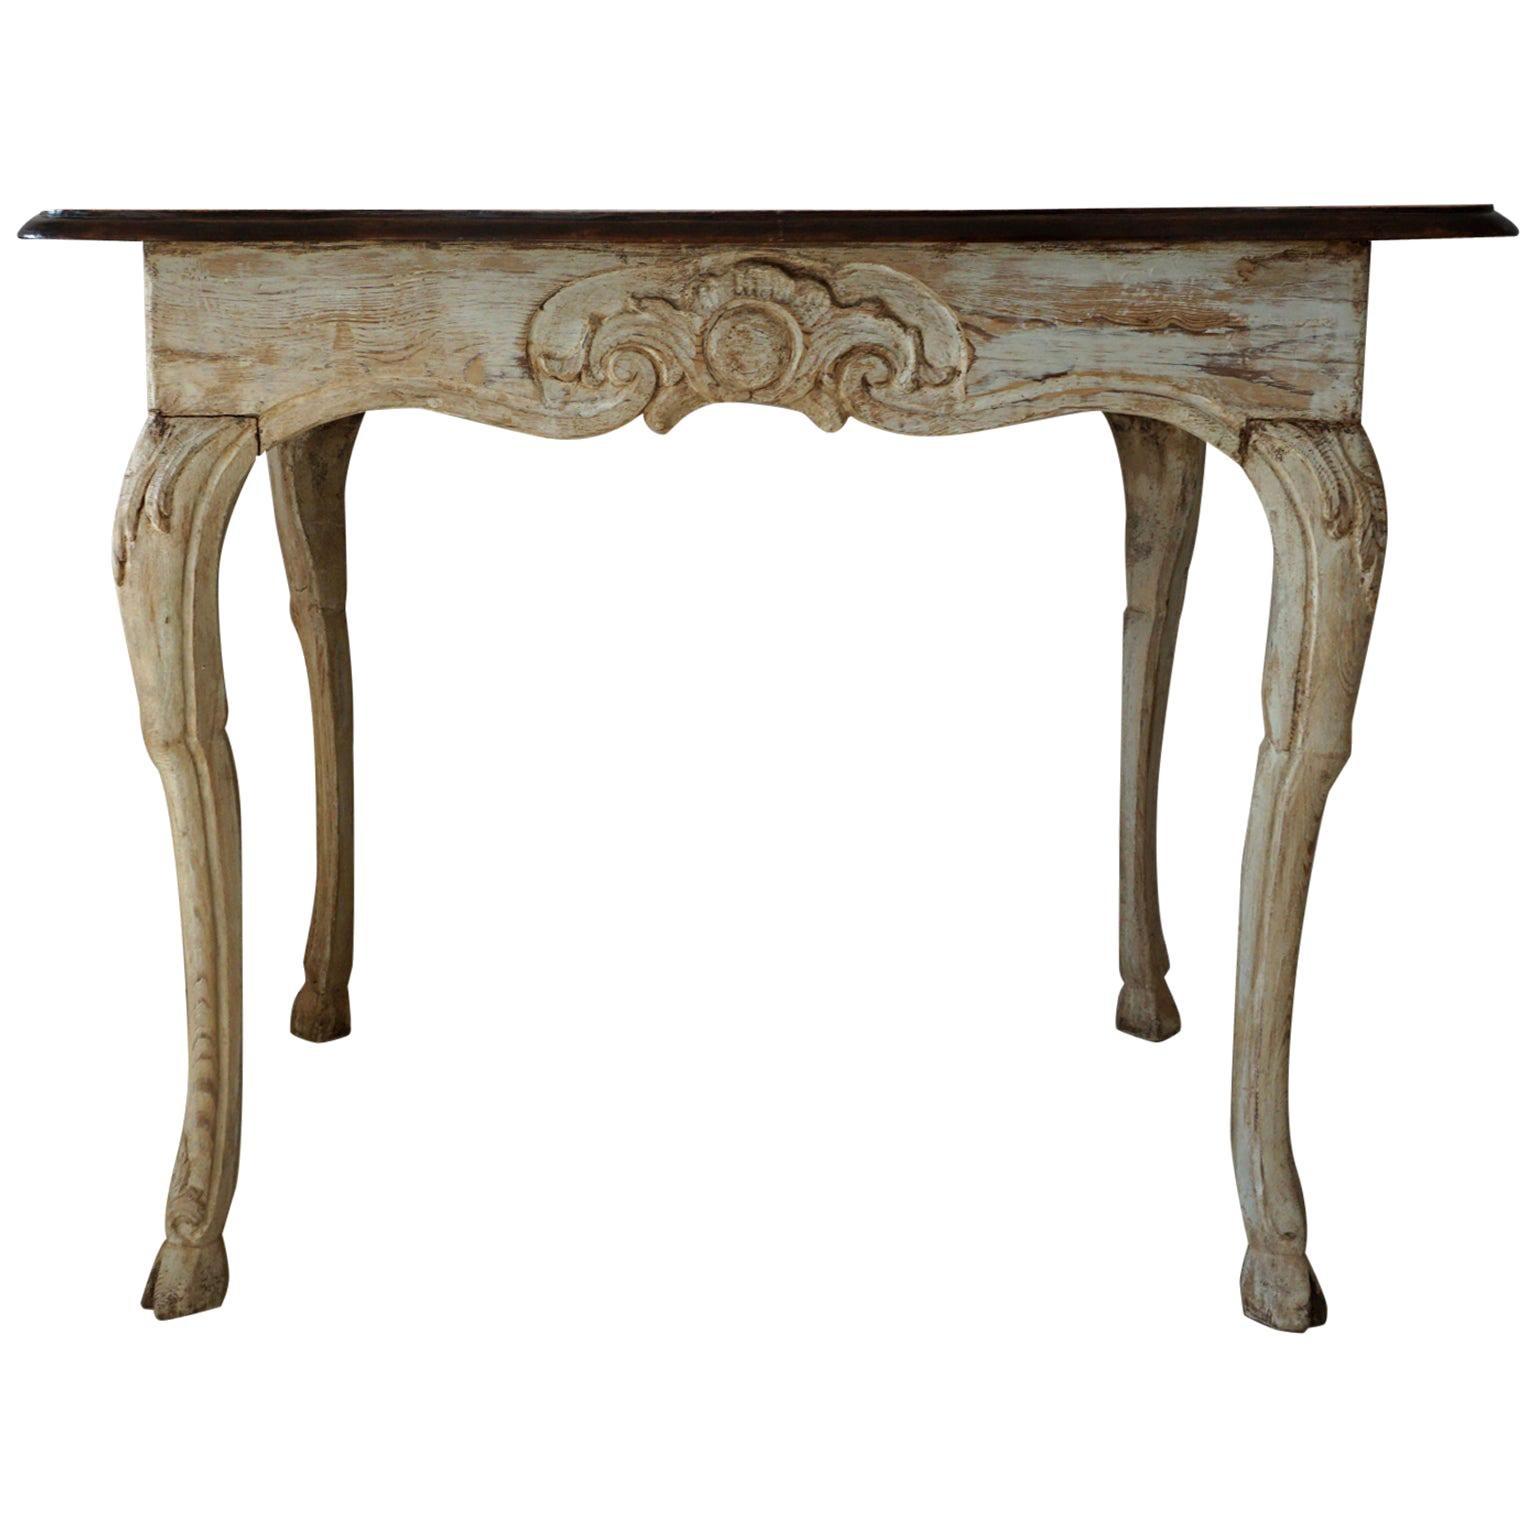 18th Century Baroque Walnut Table from Schloss Mainau, German Side Table